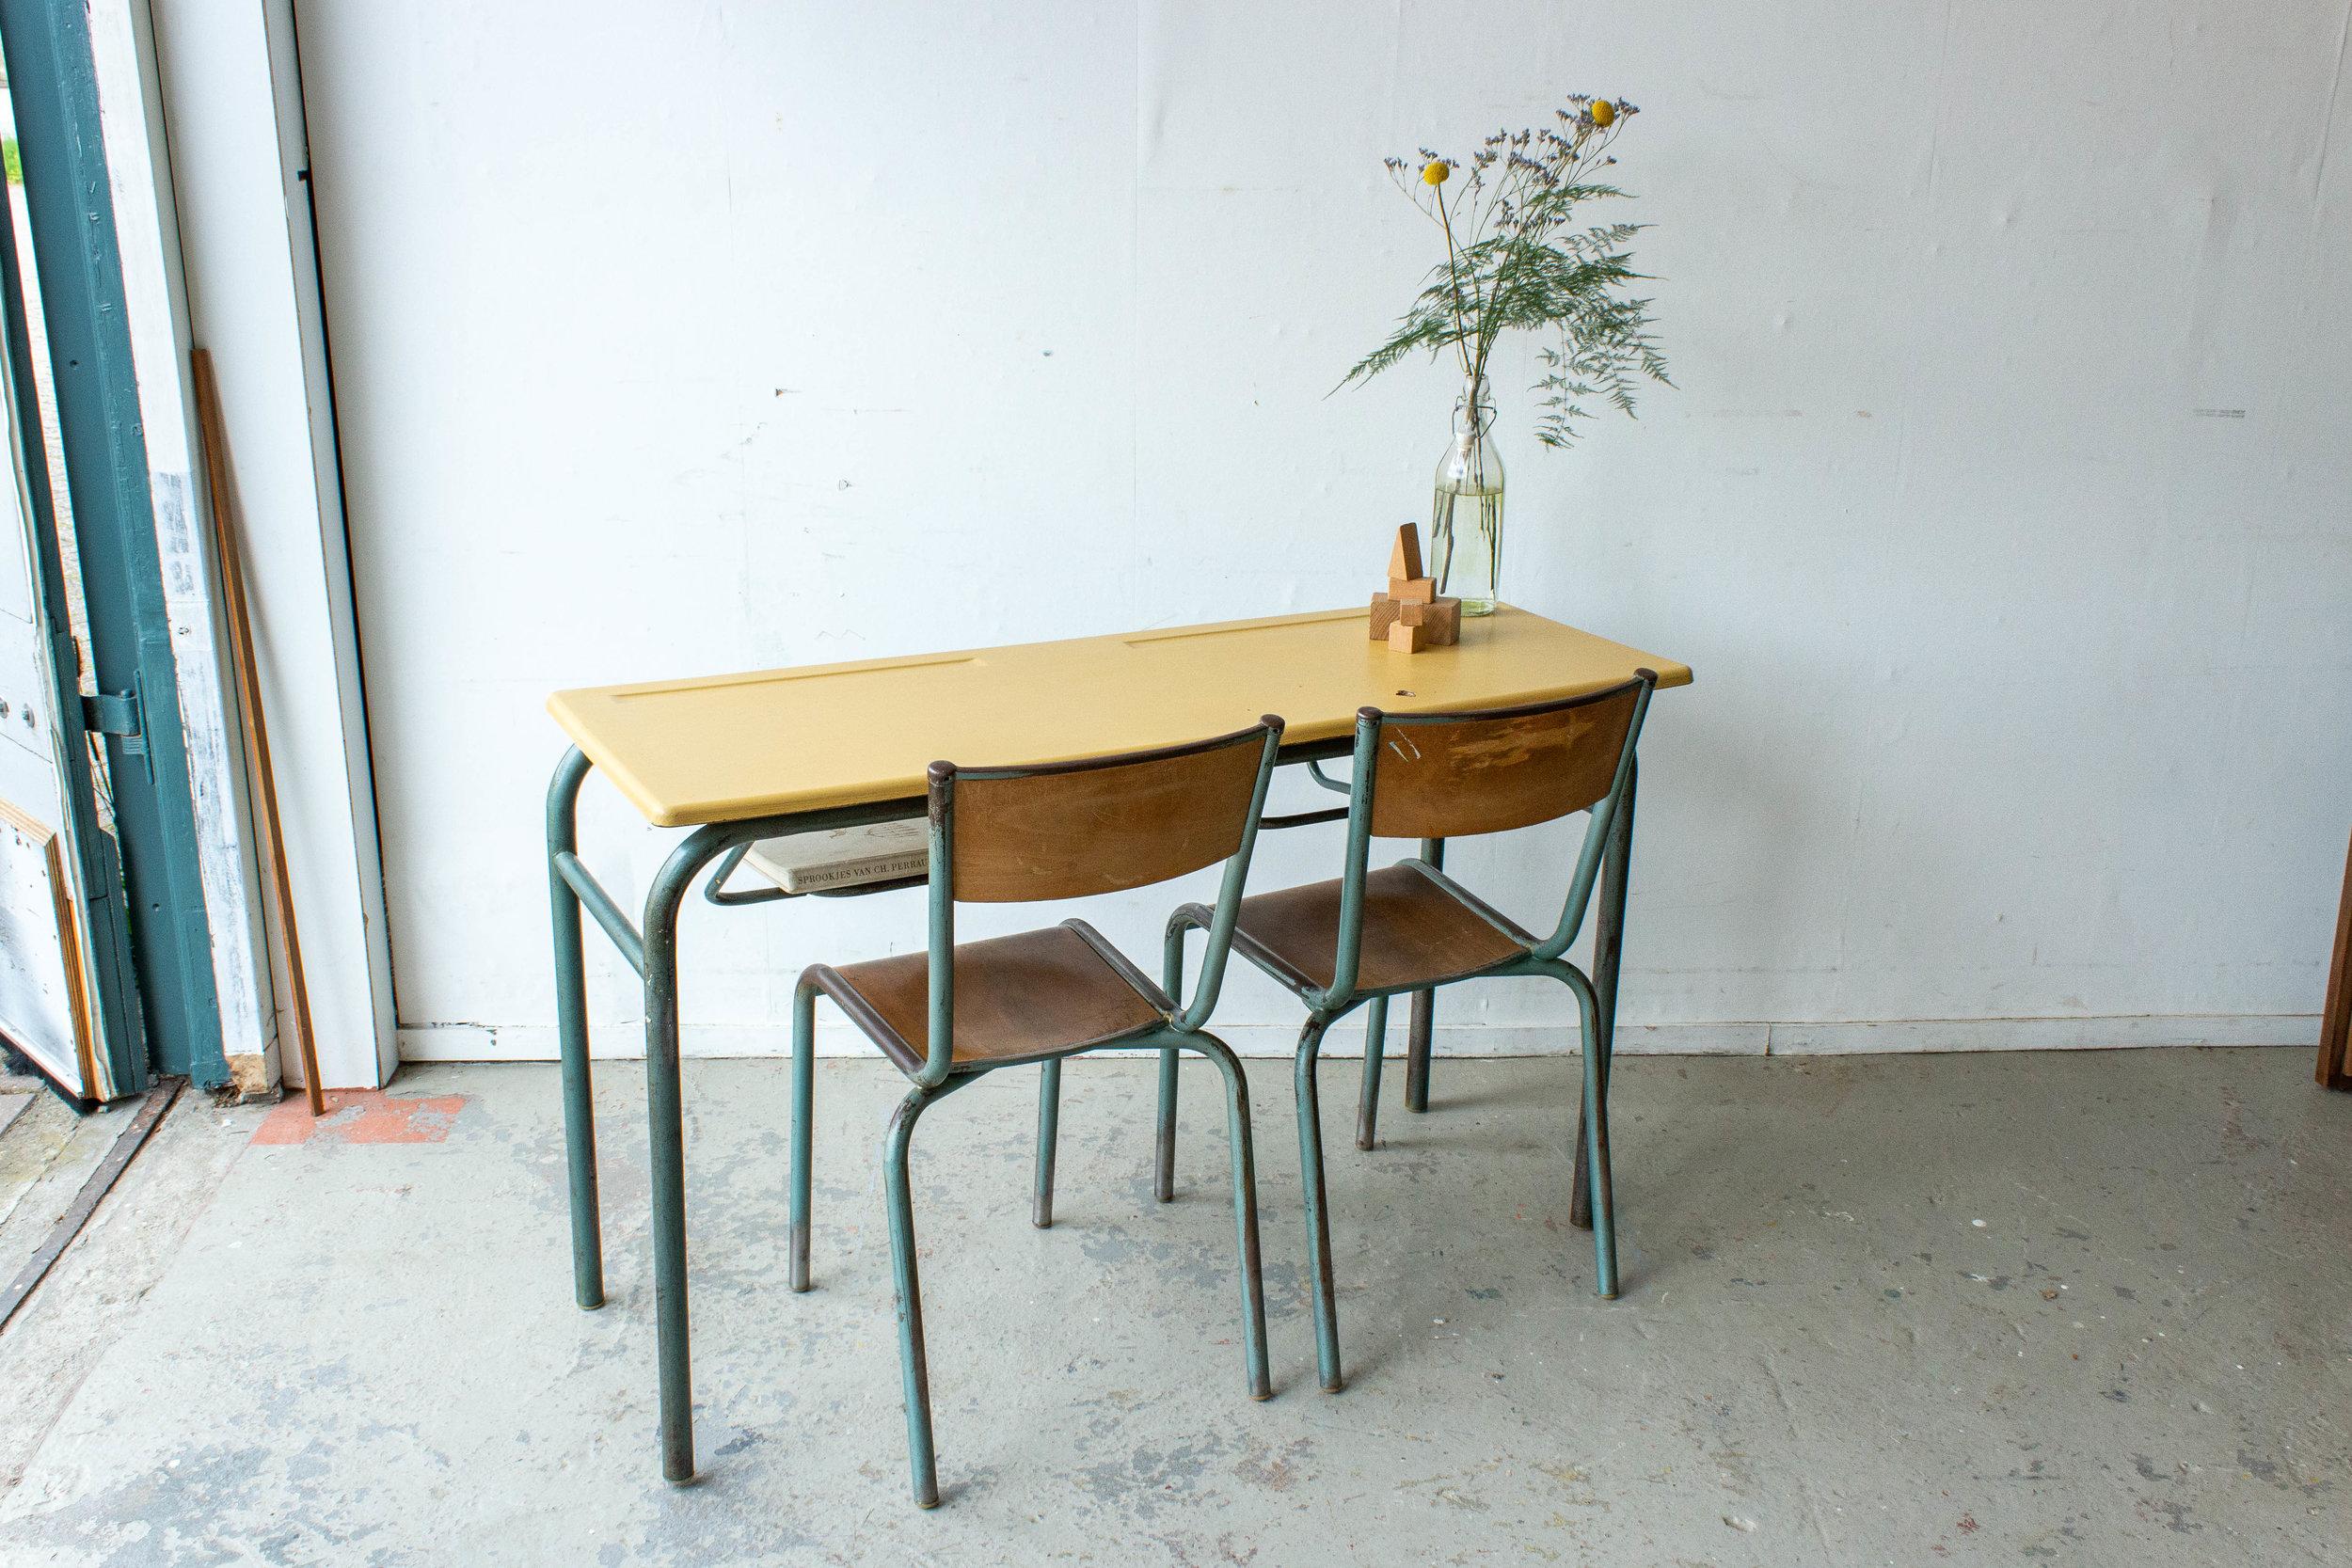 3151 - 2p vintage schooltafel met geel blad-5.jpg